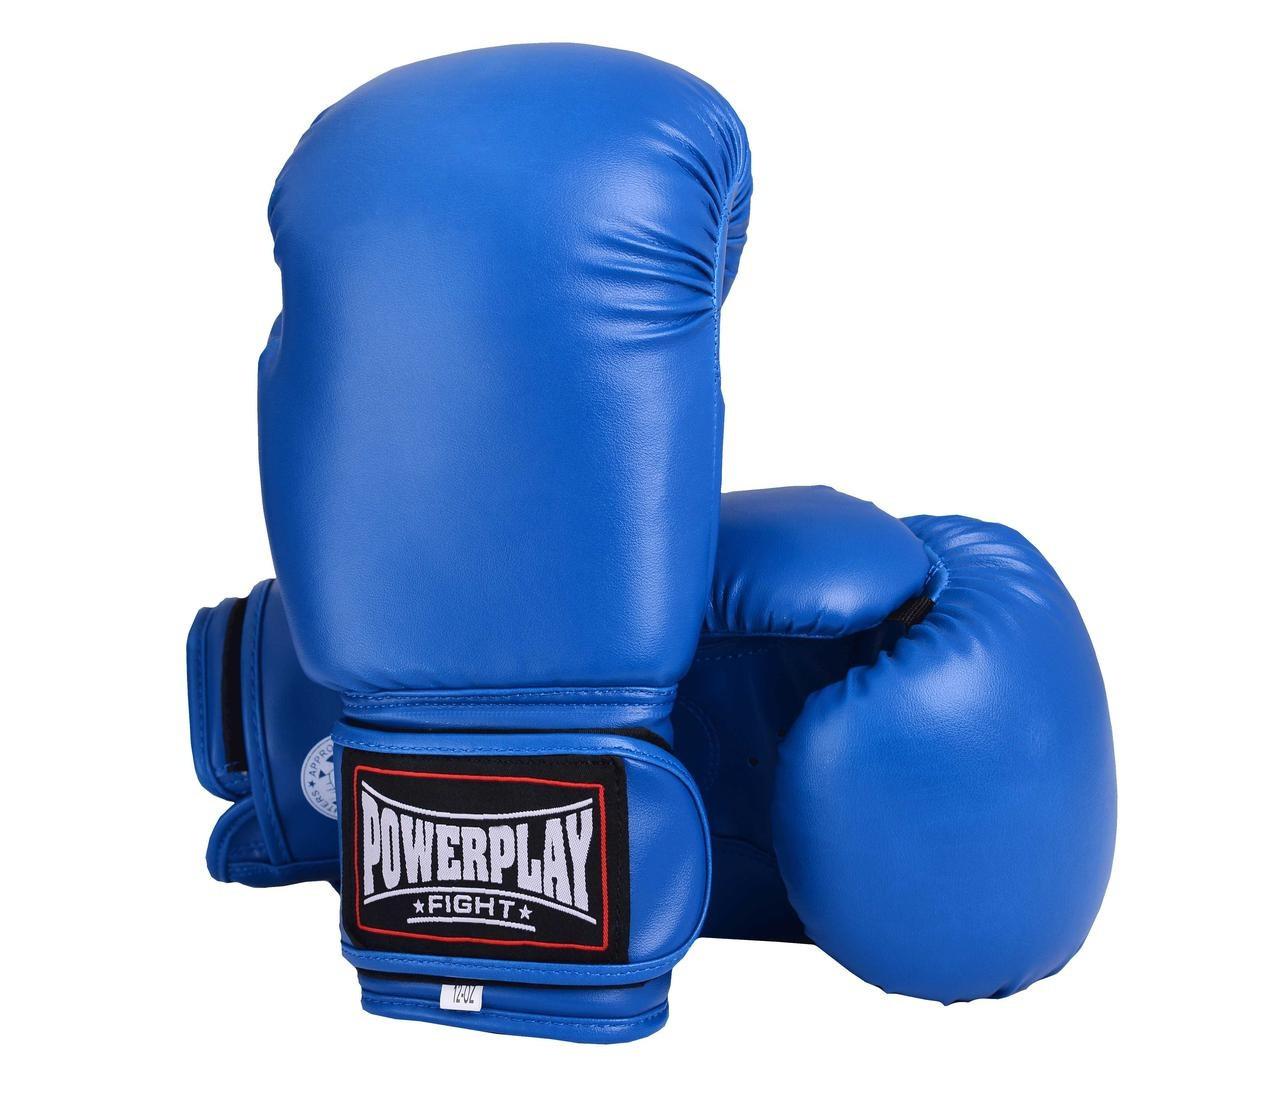 Боксерские перчатки PowerPlay 3004 Синие 10 oz 12 oz 14 oz 16 oz 18 oz